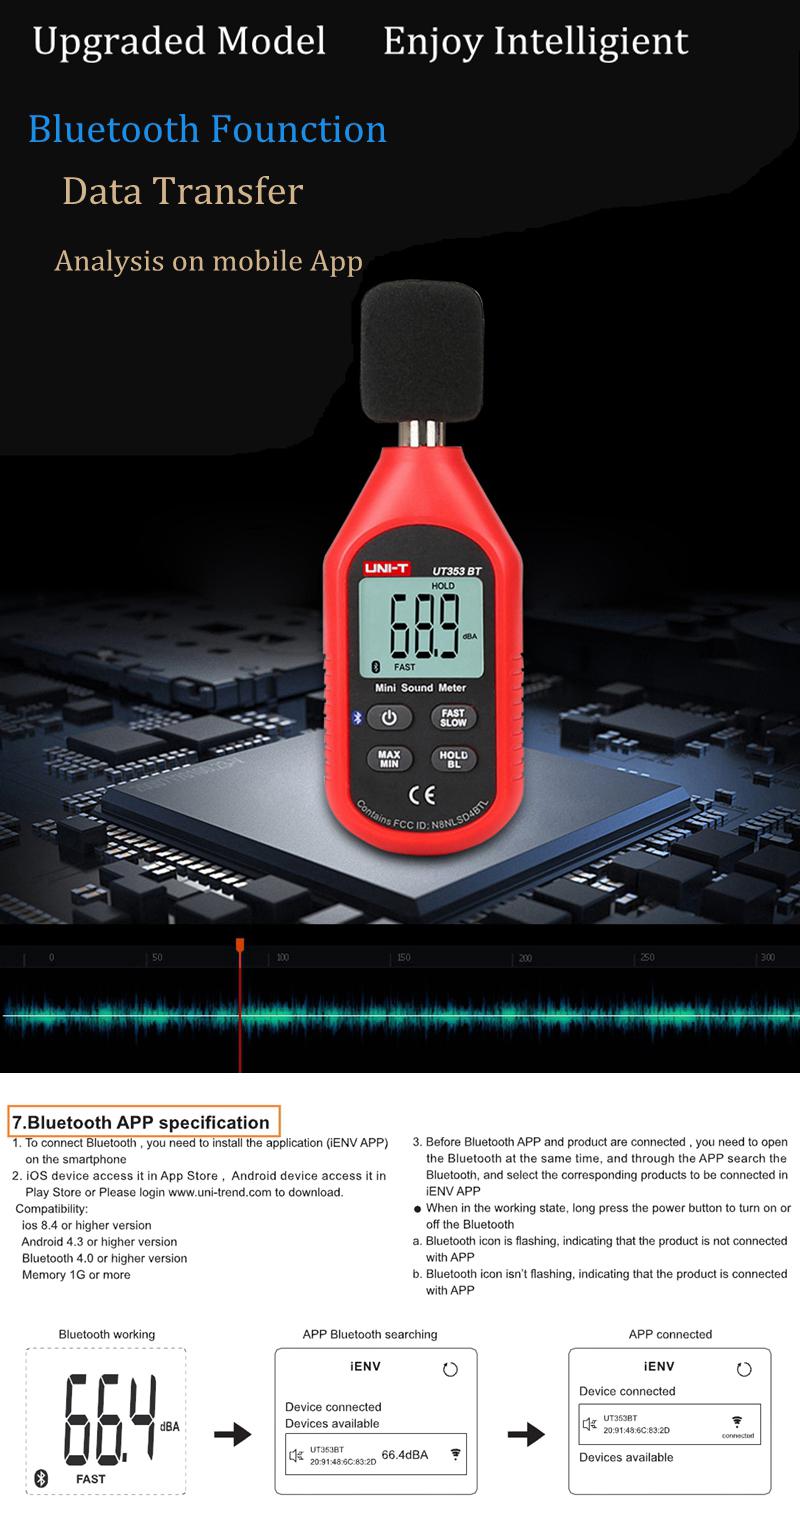 UNI-T UT353BT bluetooth Sound Level Meter Digital Noise Tester 30-130dB  Decibel Monitoring Sound Level Meter